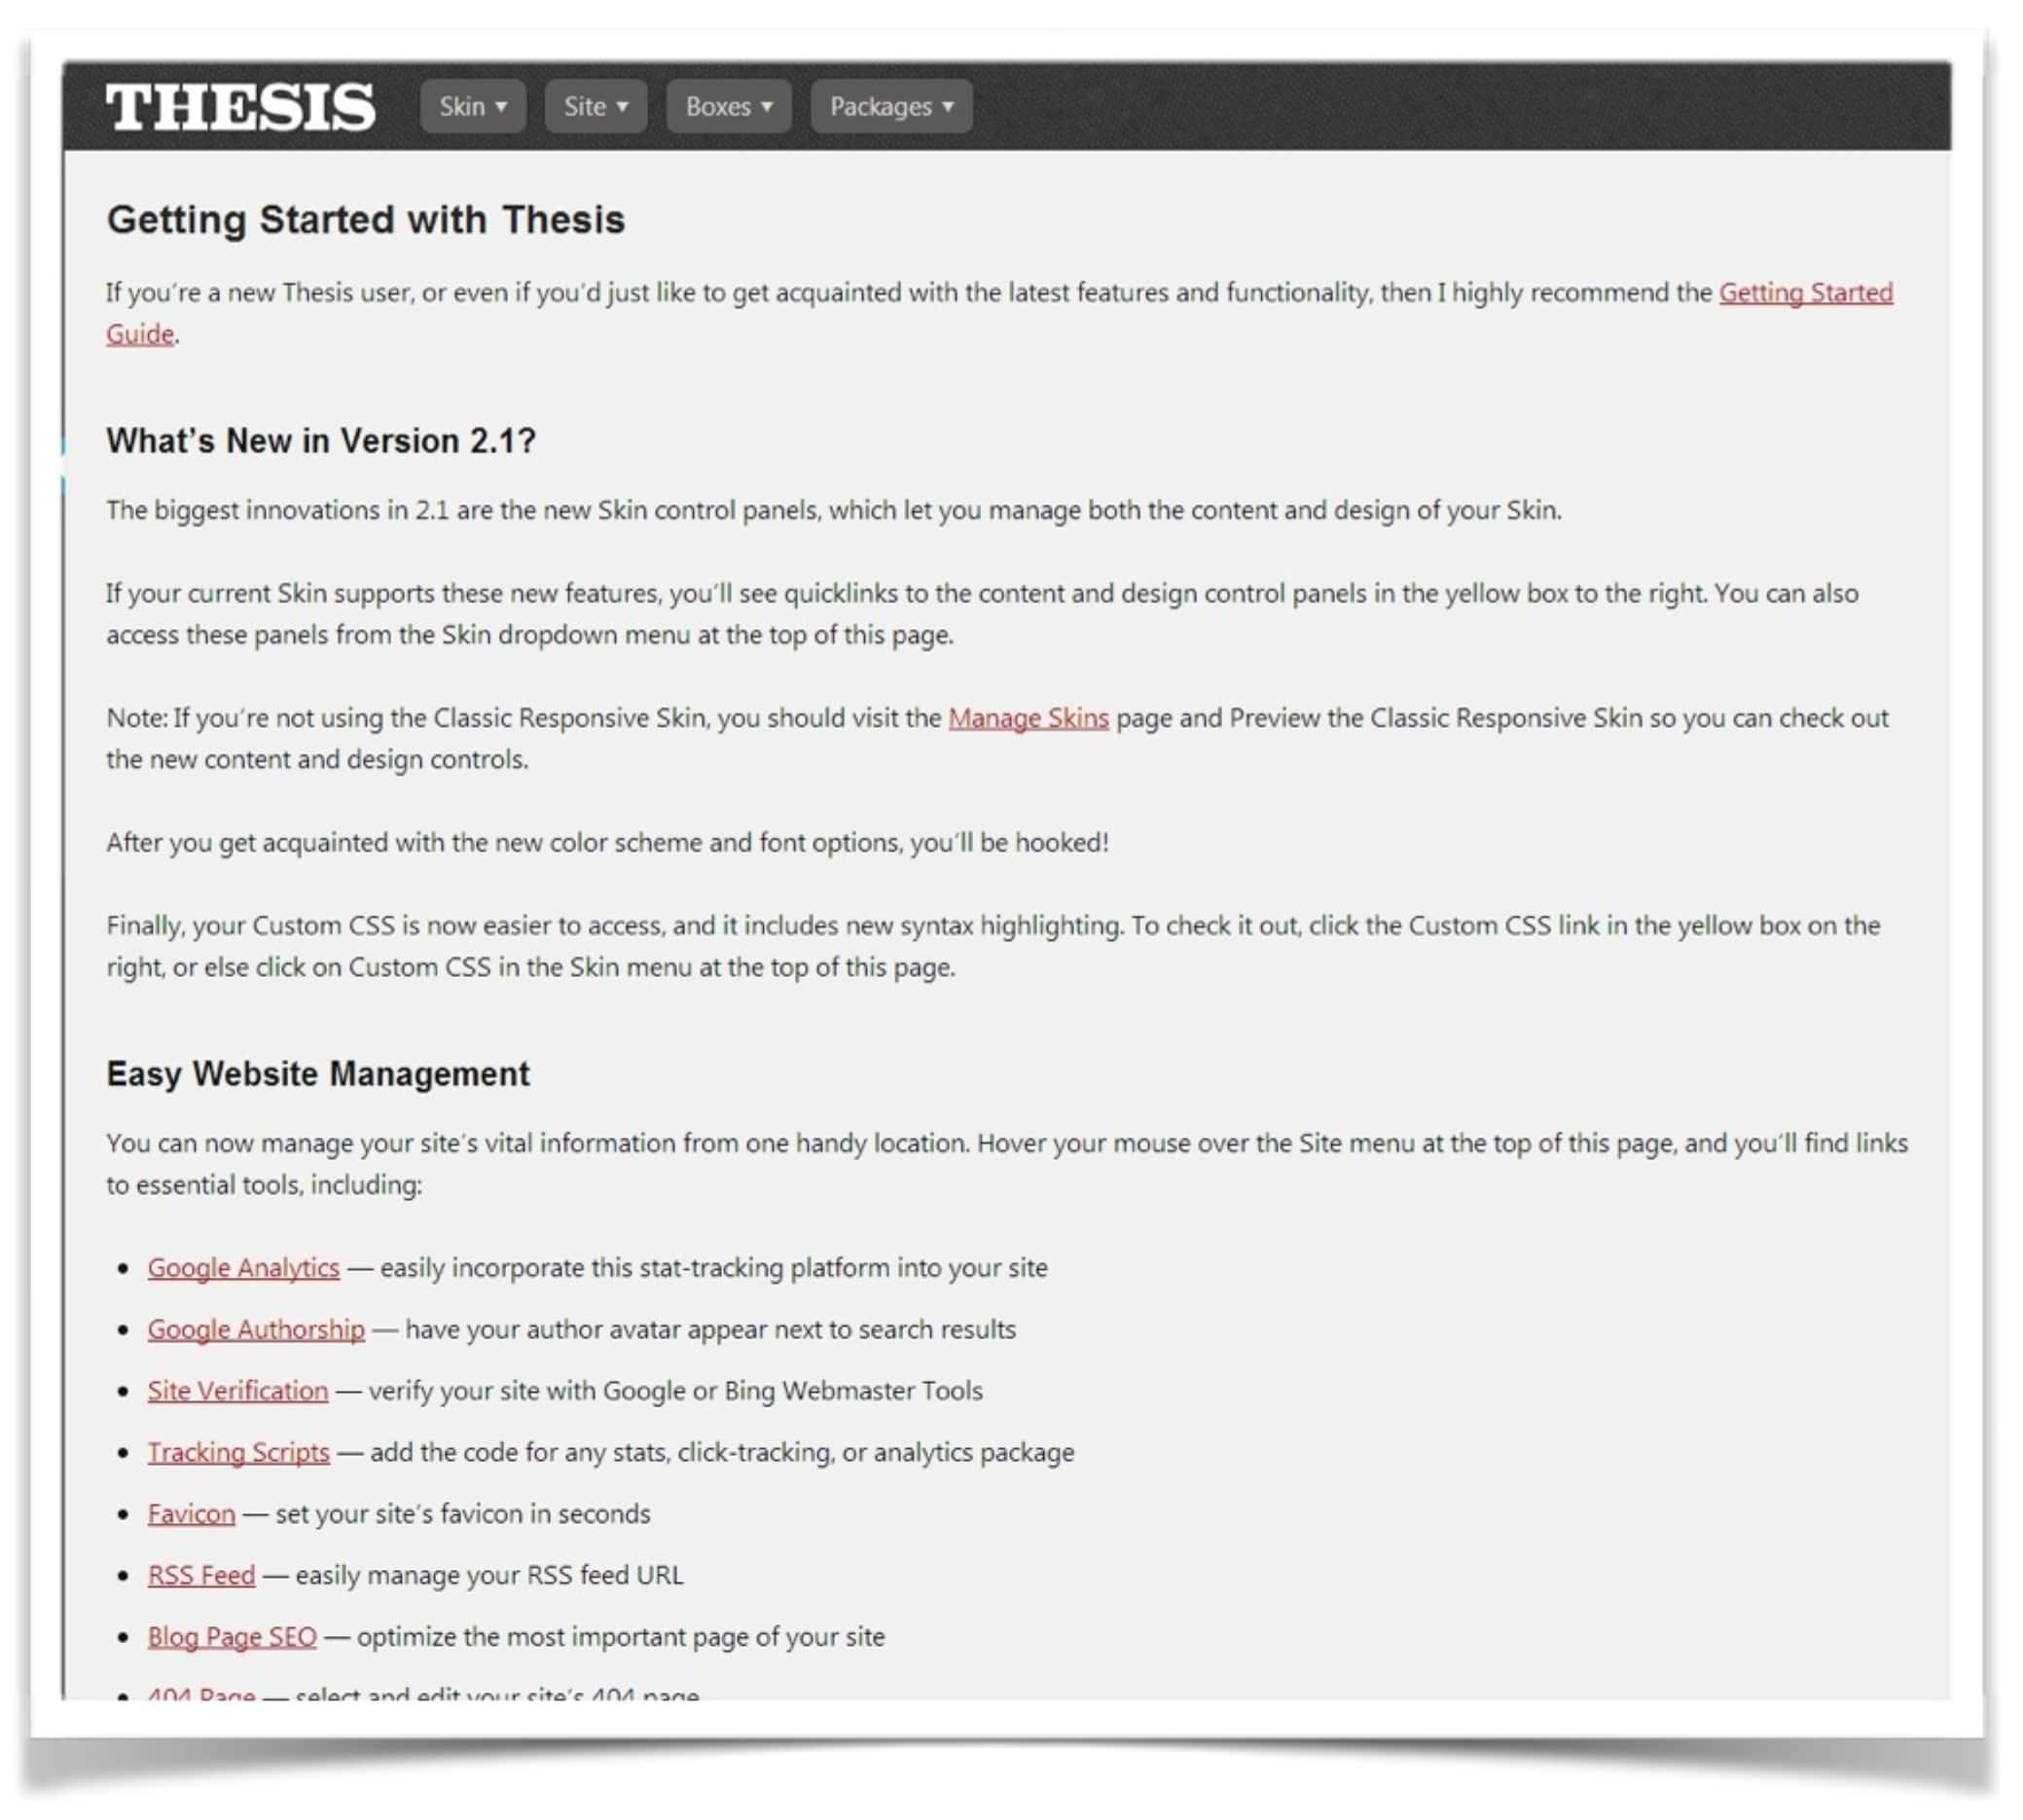 Top Dissertation Writing Service & Help | DissertatiON Time